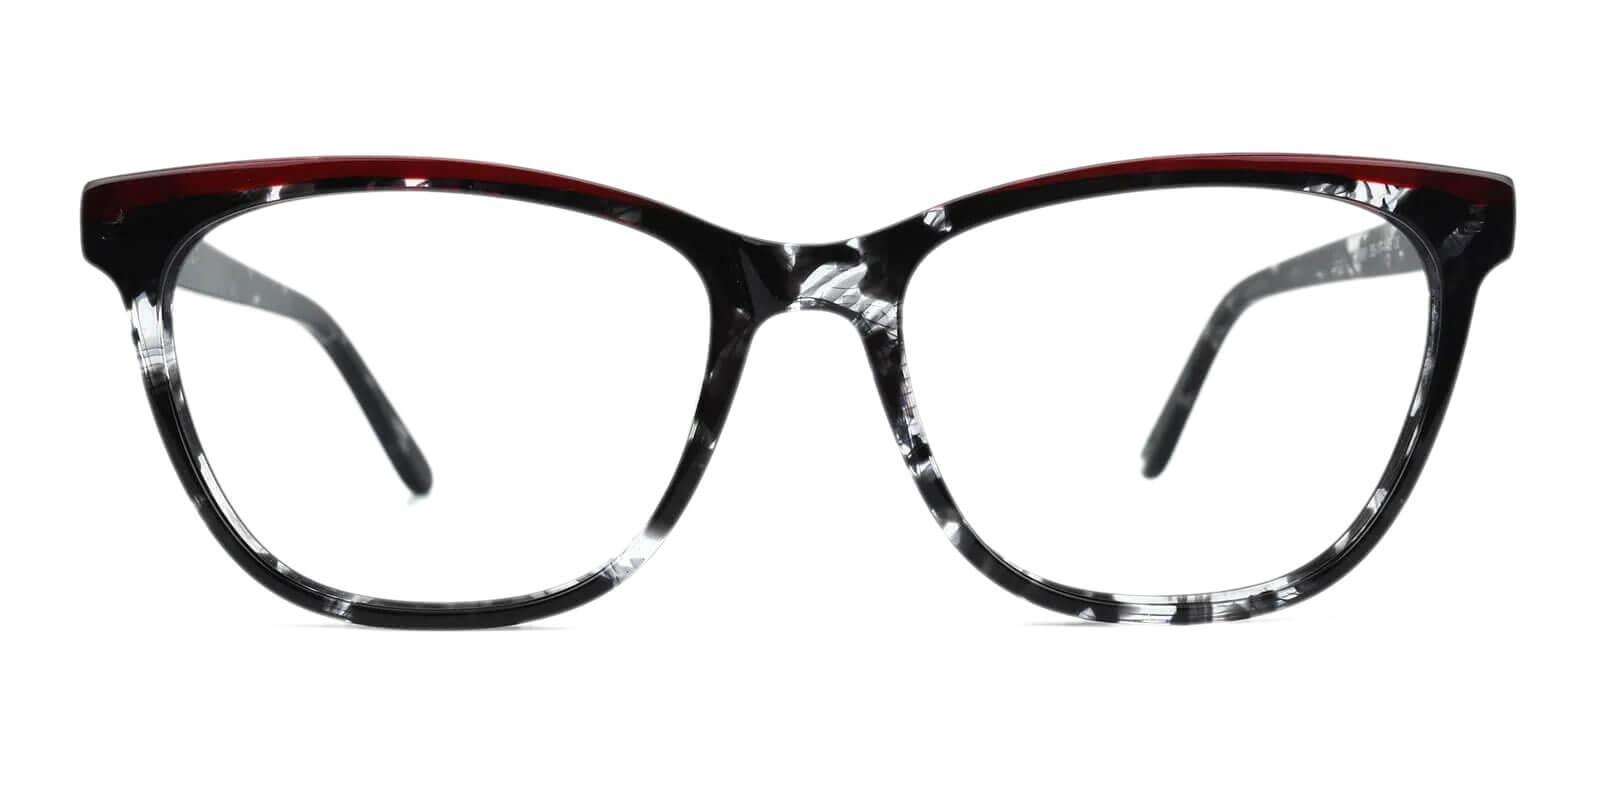 Volary Multicolor Acetate Eyeglasses , SpringHinges , UniversalBridgeFit Frames from ABBE Glasses